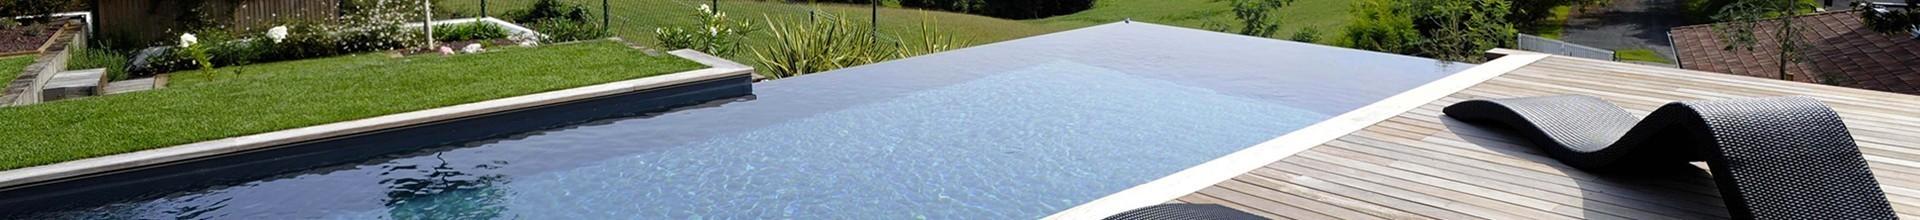 ✅ Rhône Alpes Kit piscine béton Haute Loire fabricant